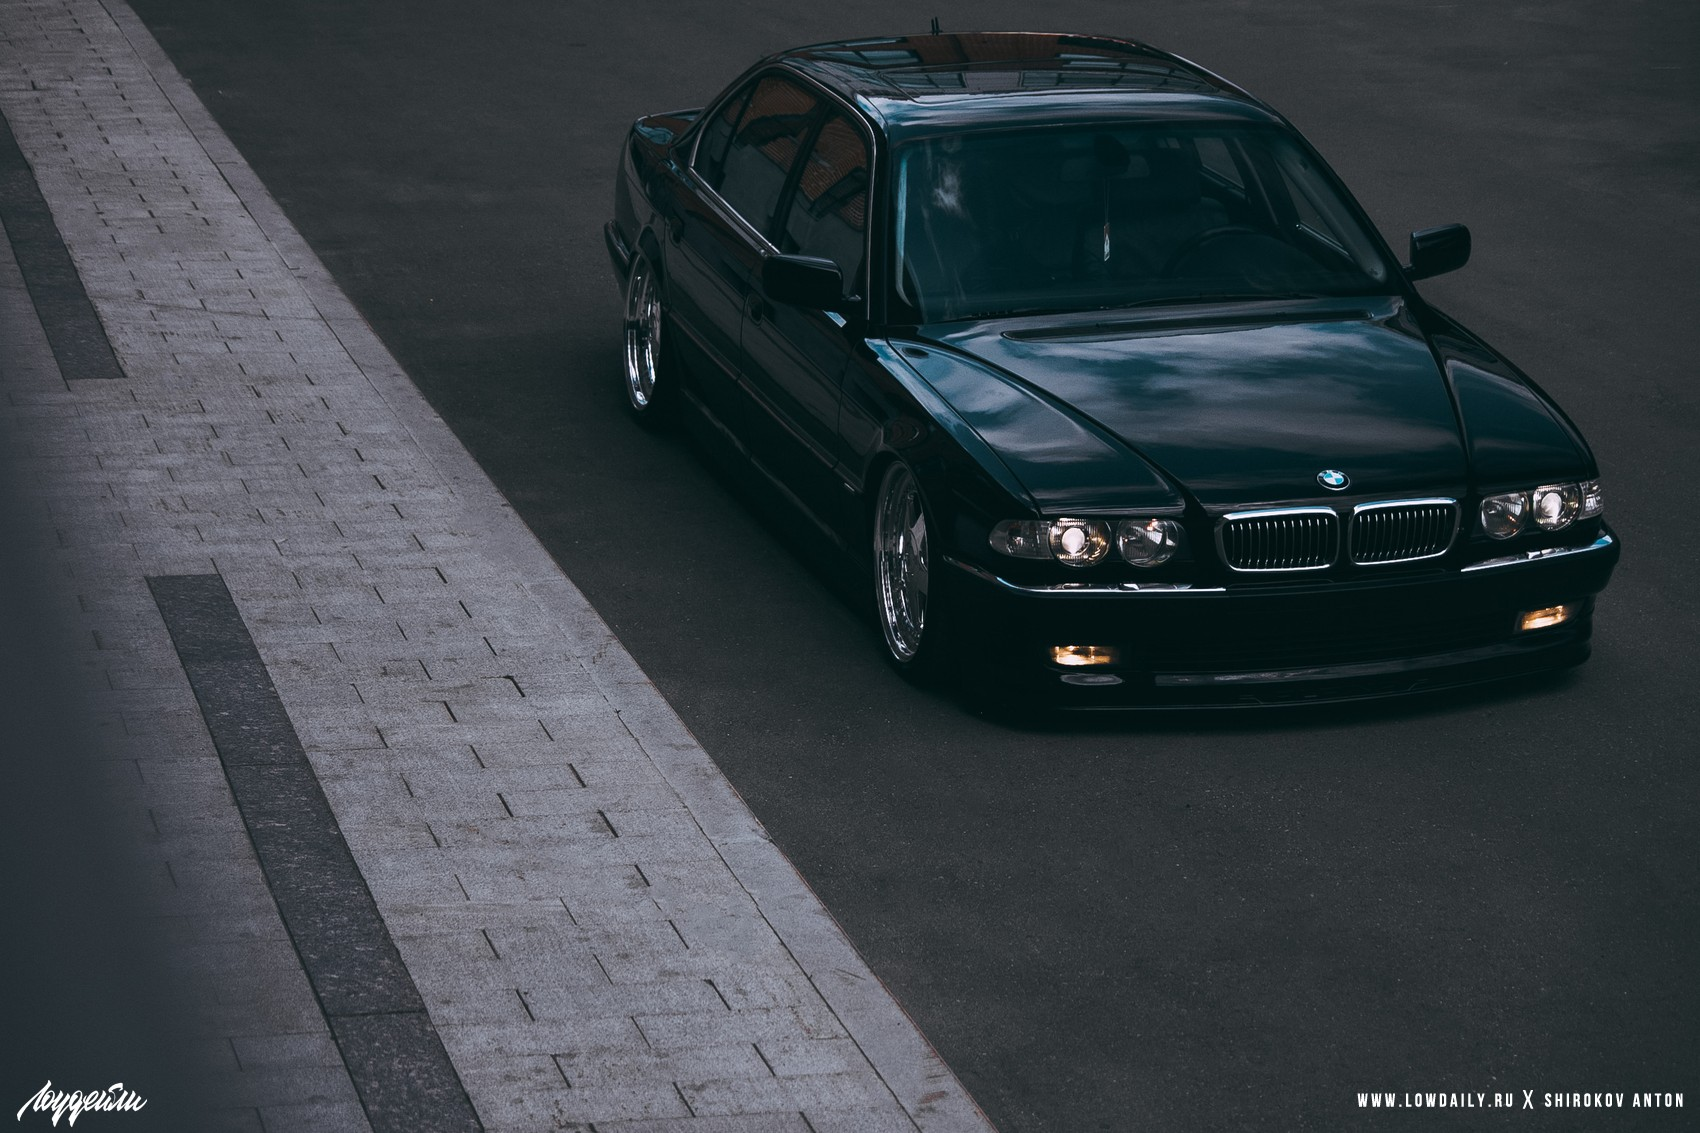 BMW E38 Lowdaily _MG_7041